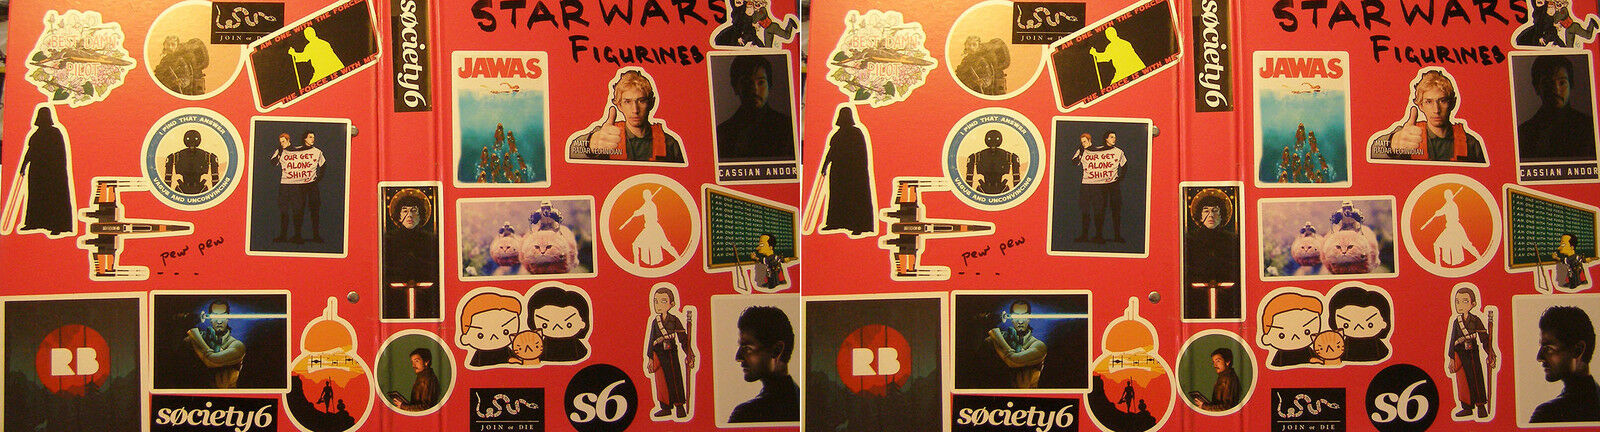 Imperials_Rogues&Rebels_Downunder